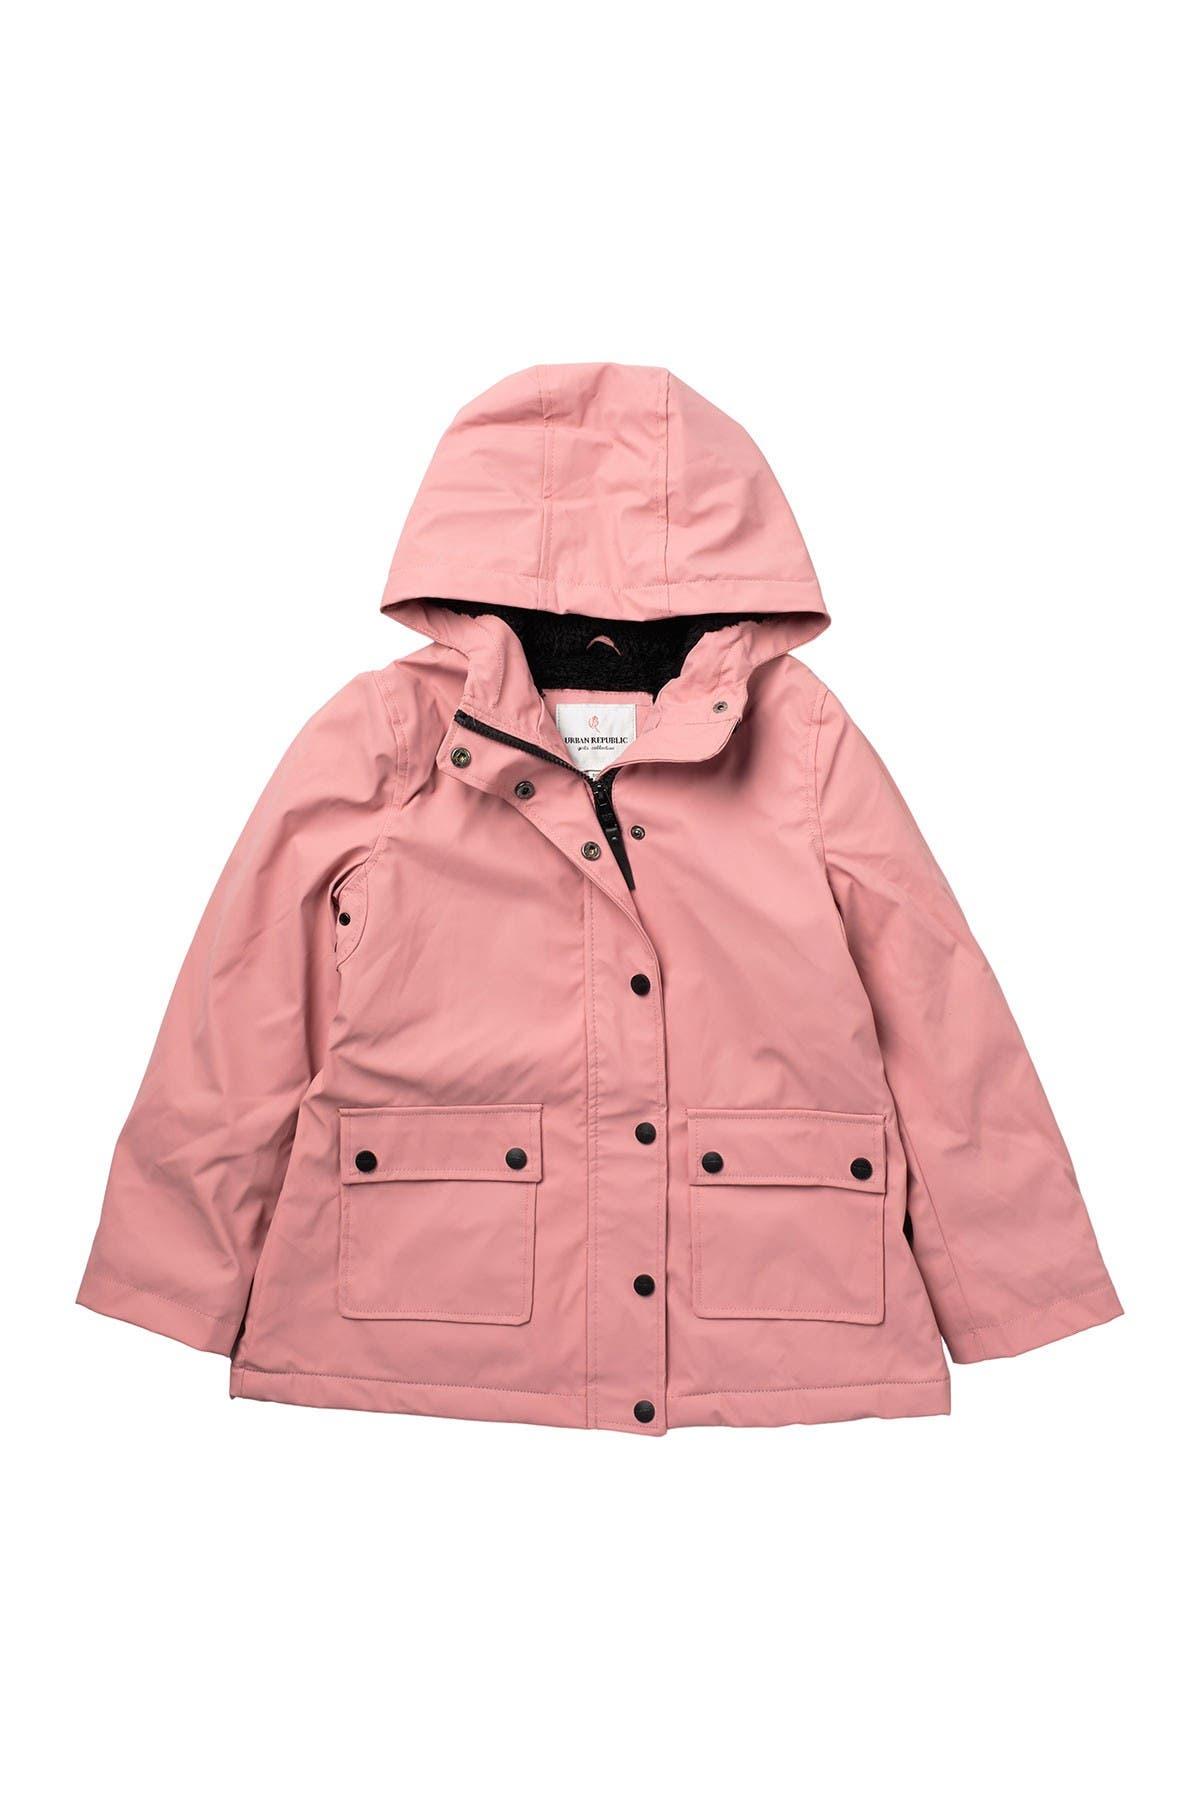 Image of Urban Republic Hooded Faux Shearling Lined Rain Coat